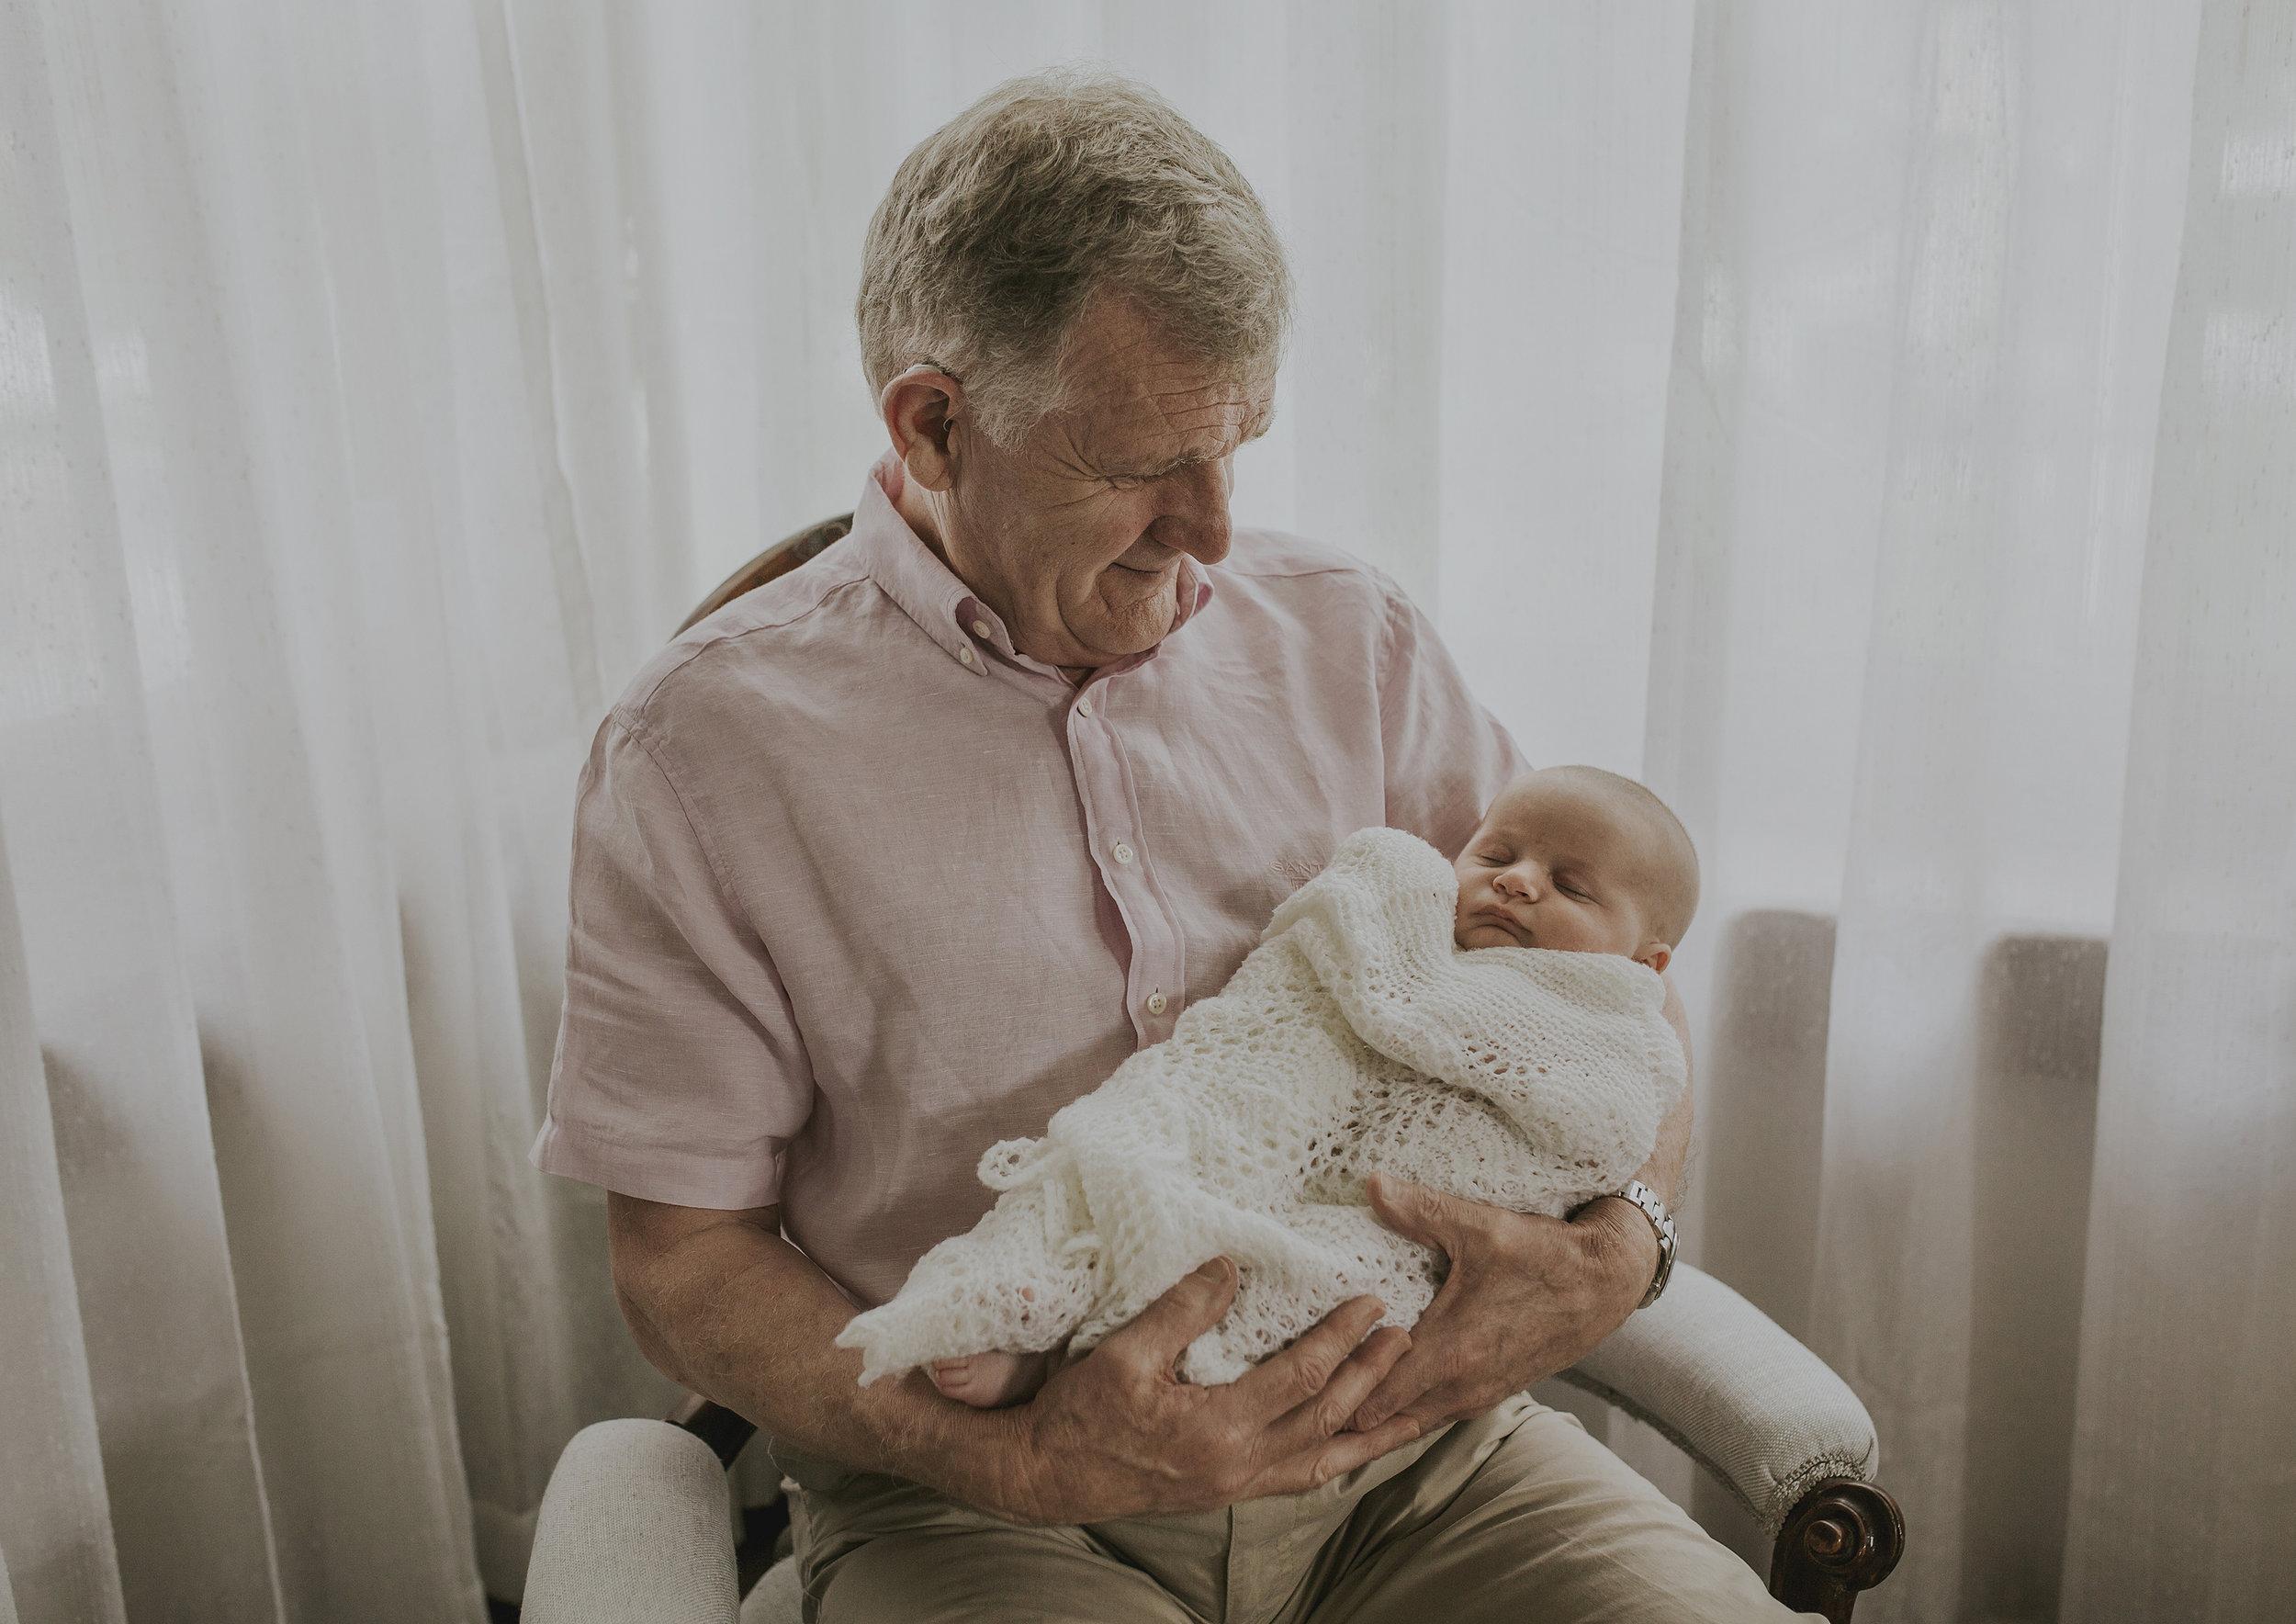 Grandfather holding his newborn grandson